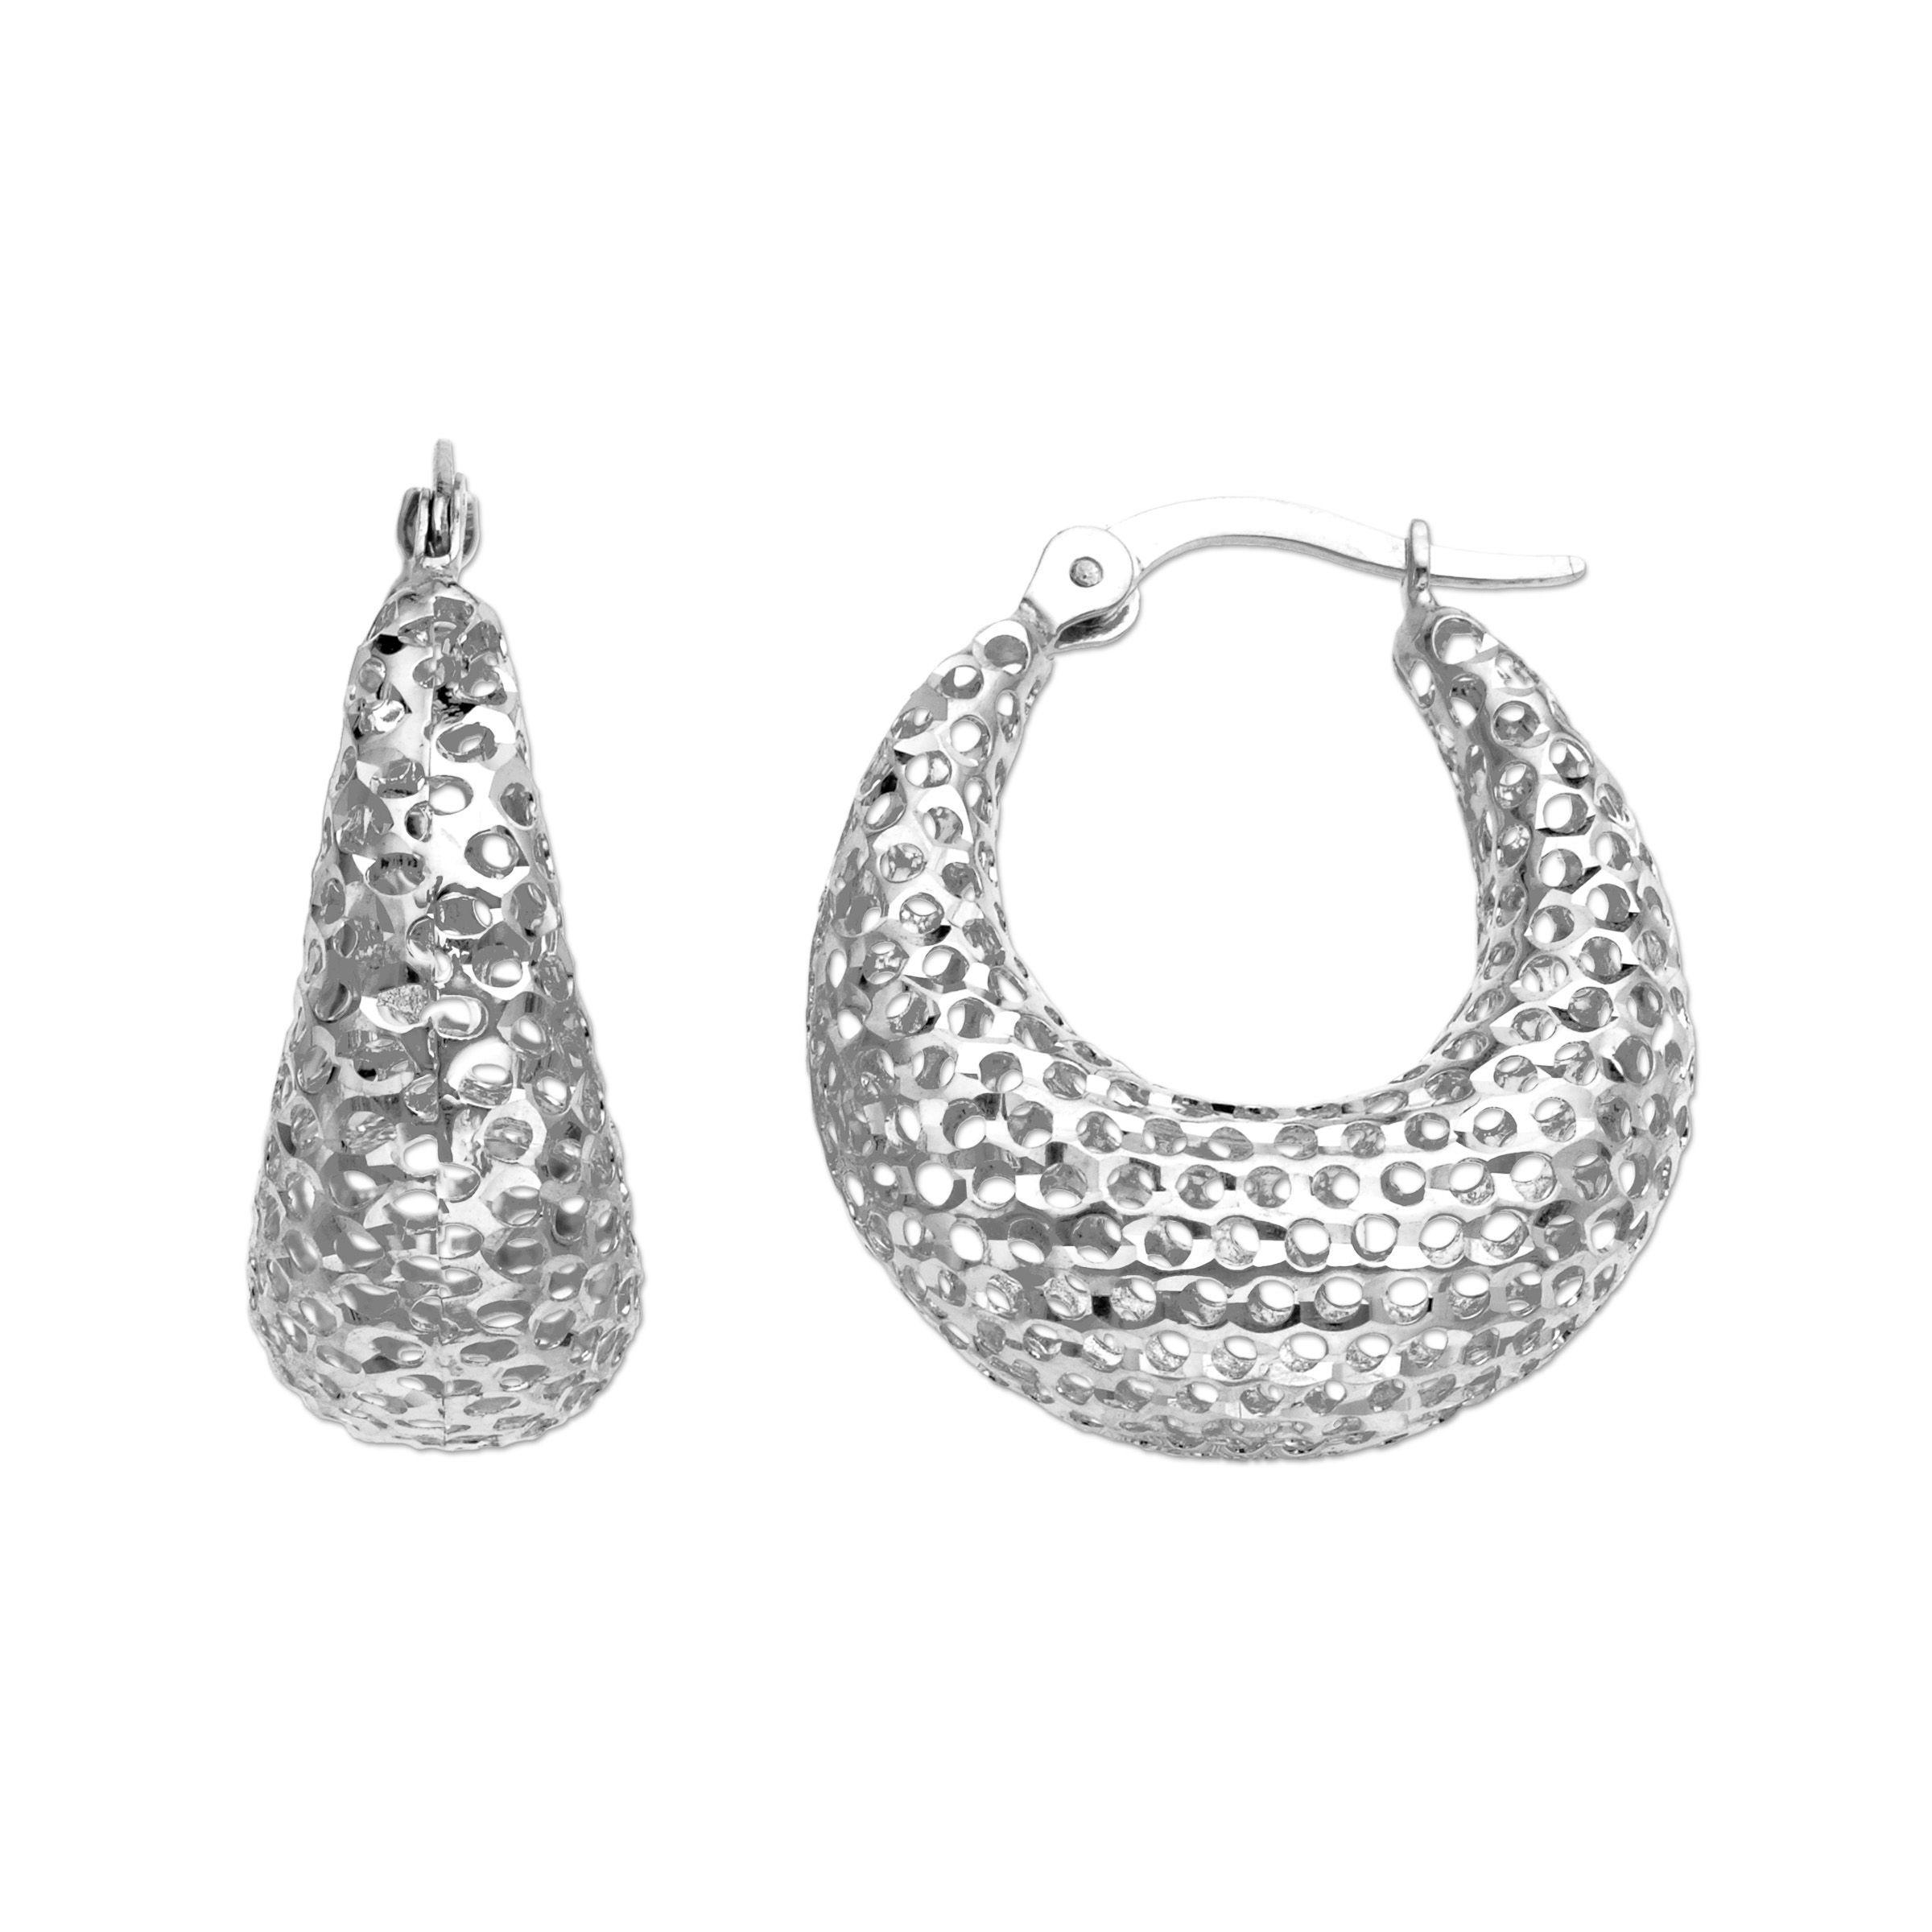 c0a76059b Eternity Gold Mesh Hoop Earrings in 14K White Gold 729367825131 | eBay